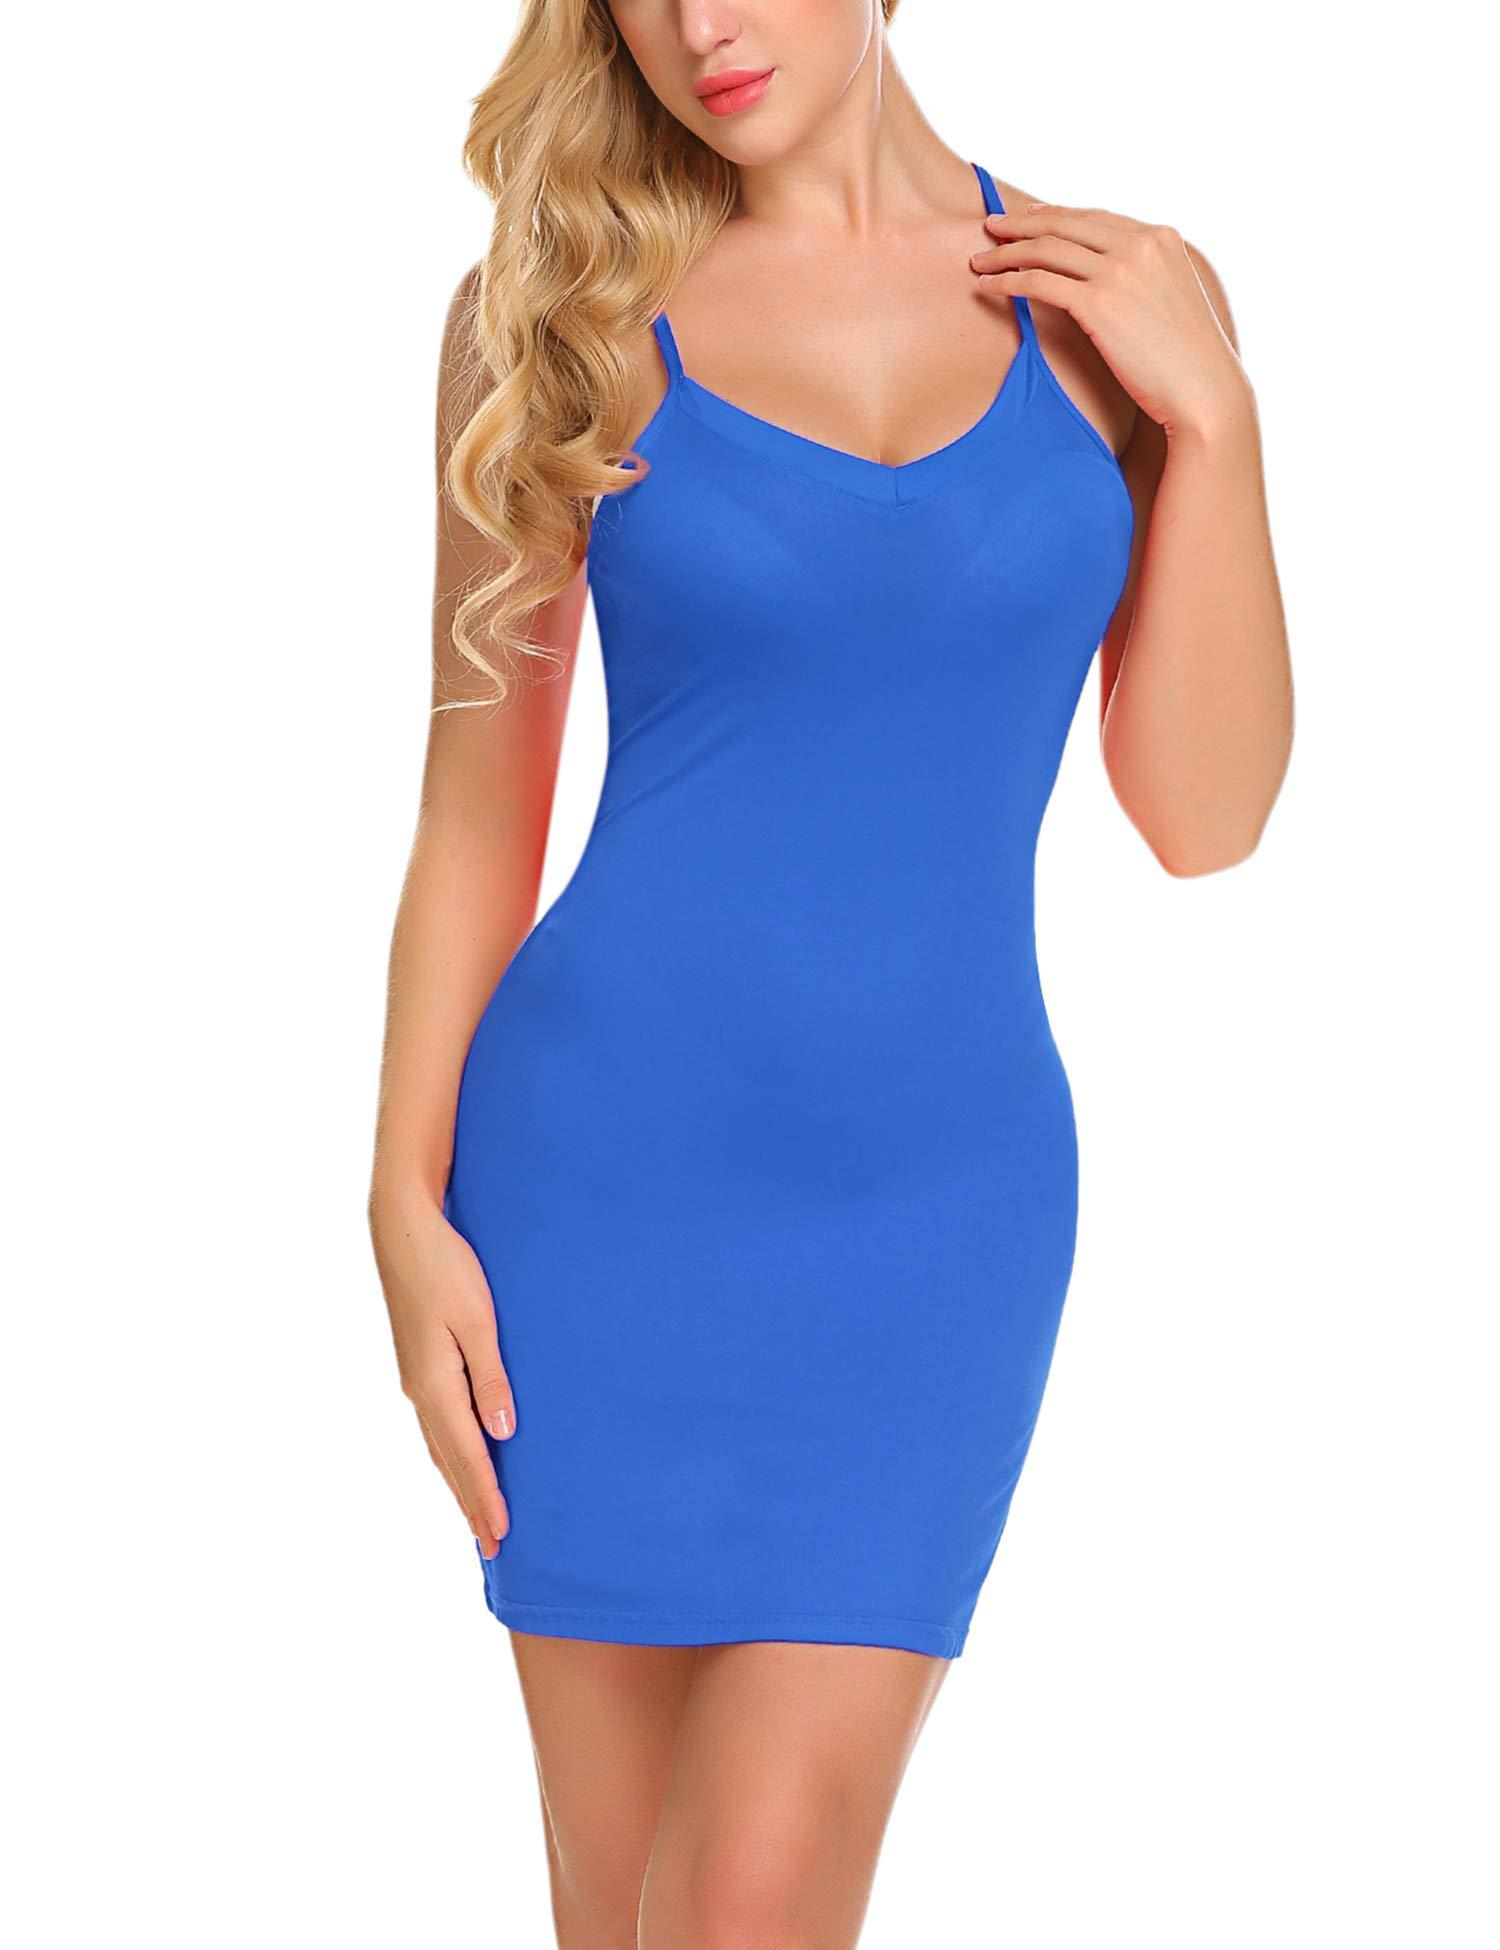 Avidlove Women's Full Slip Adjustable Spaghetti Strap Camisole Mini Dress Casual Deep V Nightgown